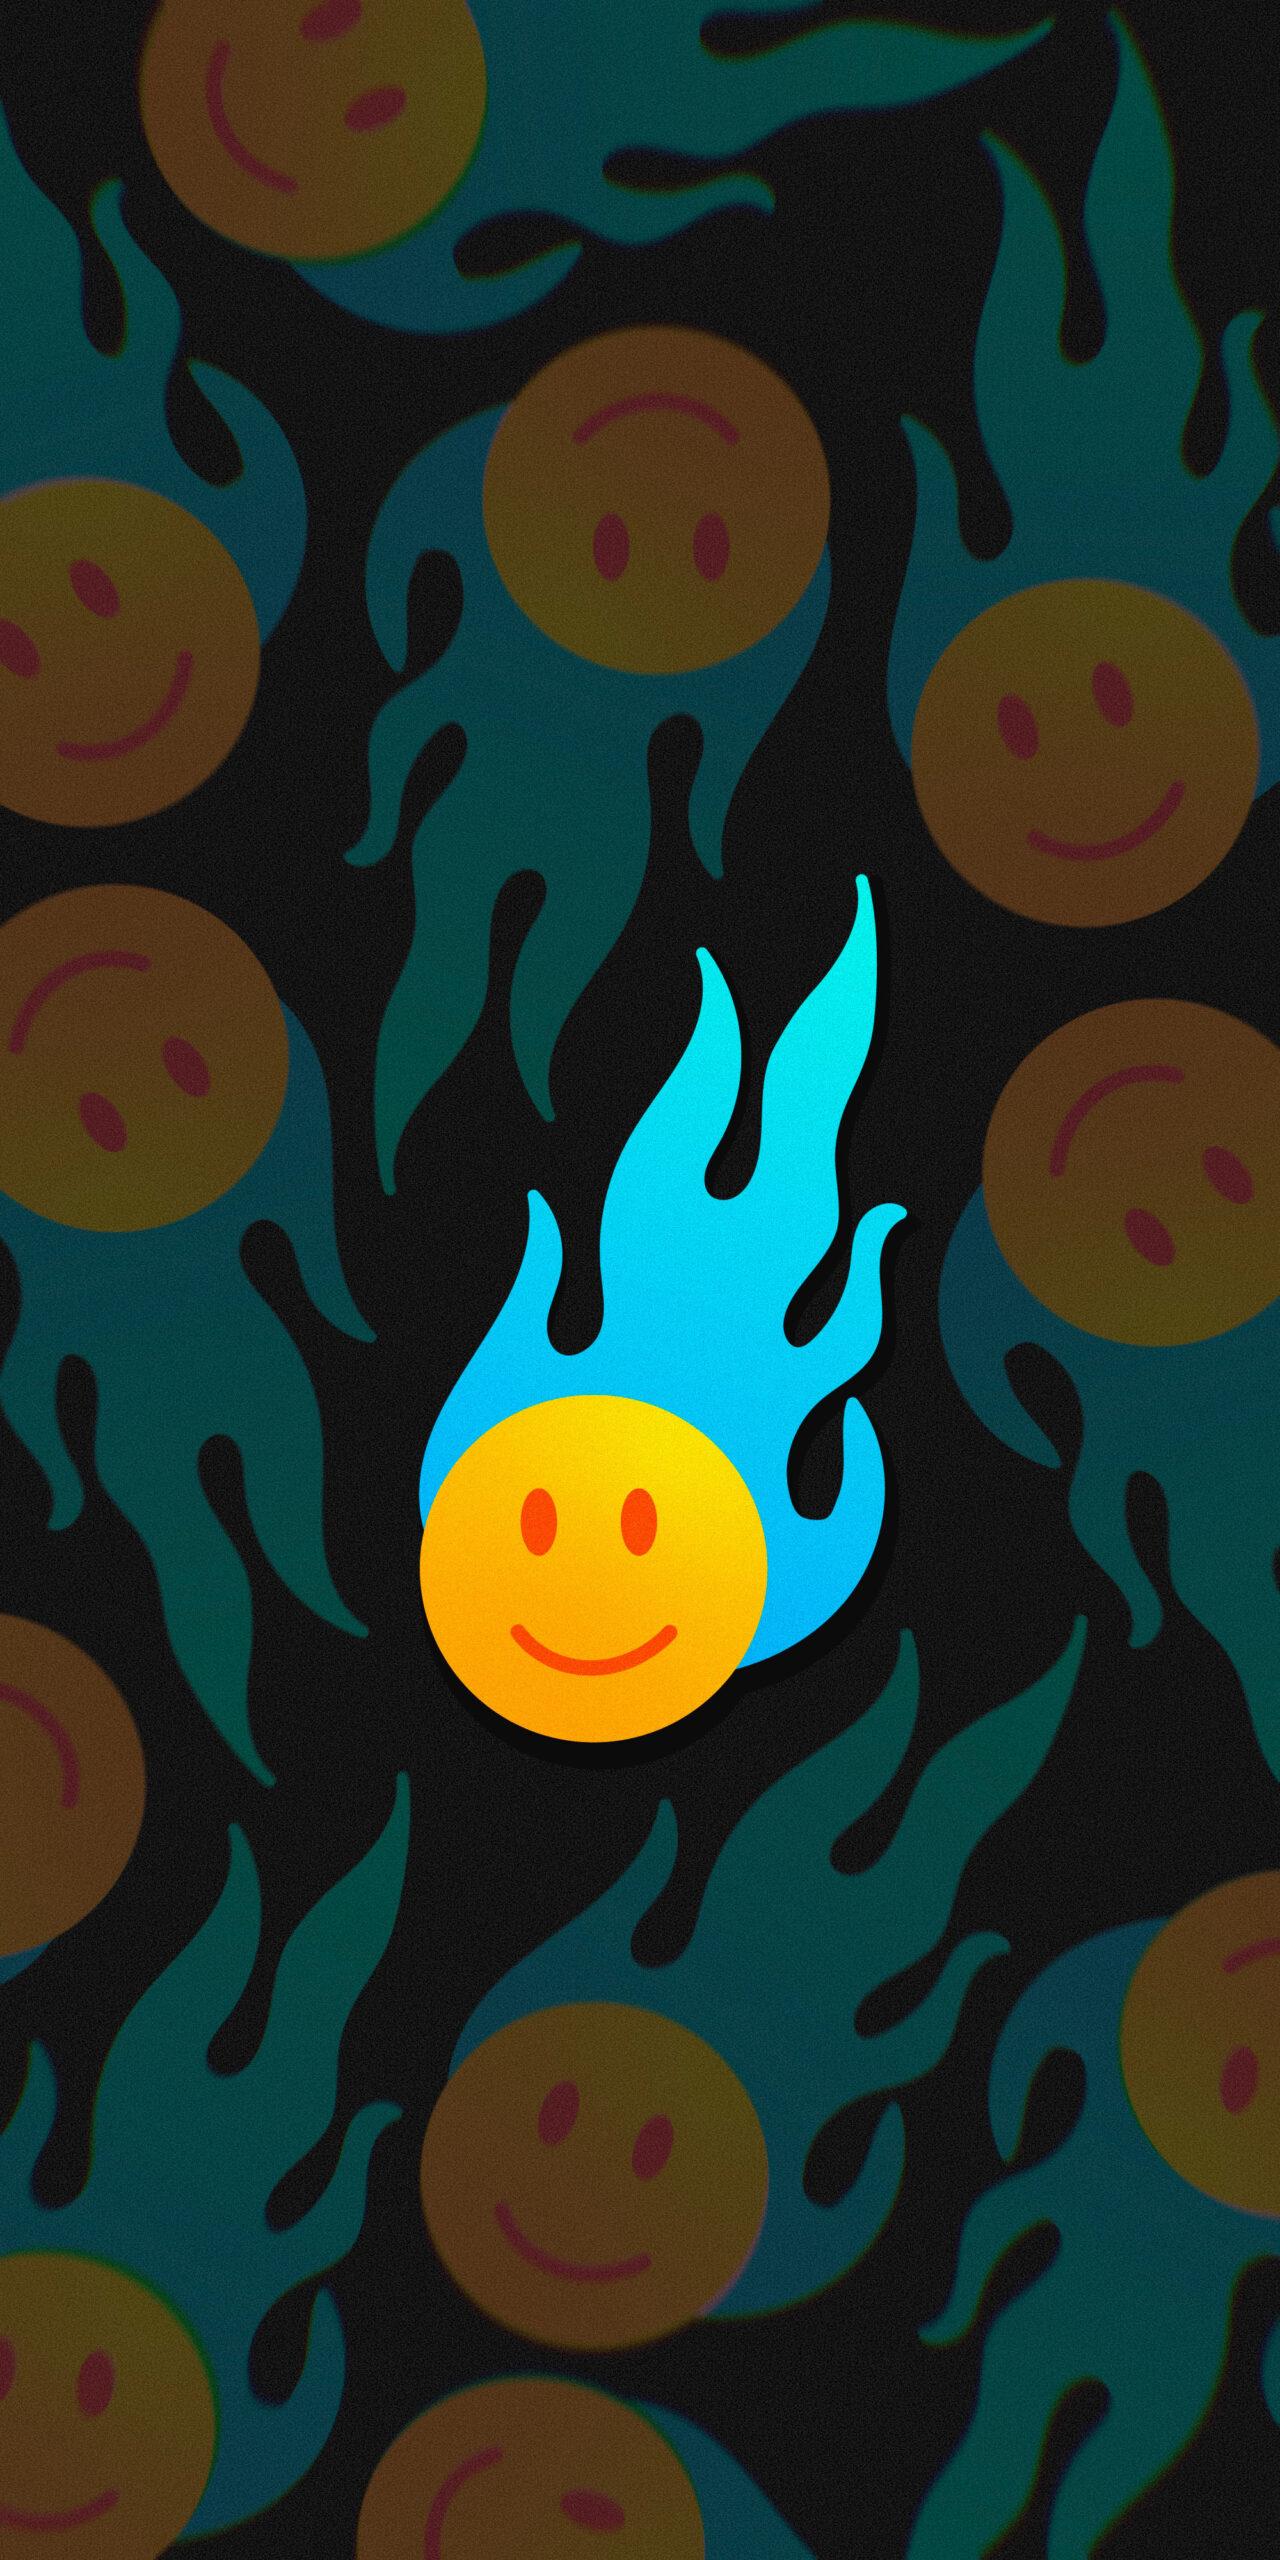 smile face blue flame black 2 wallpaper